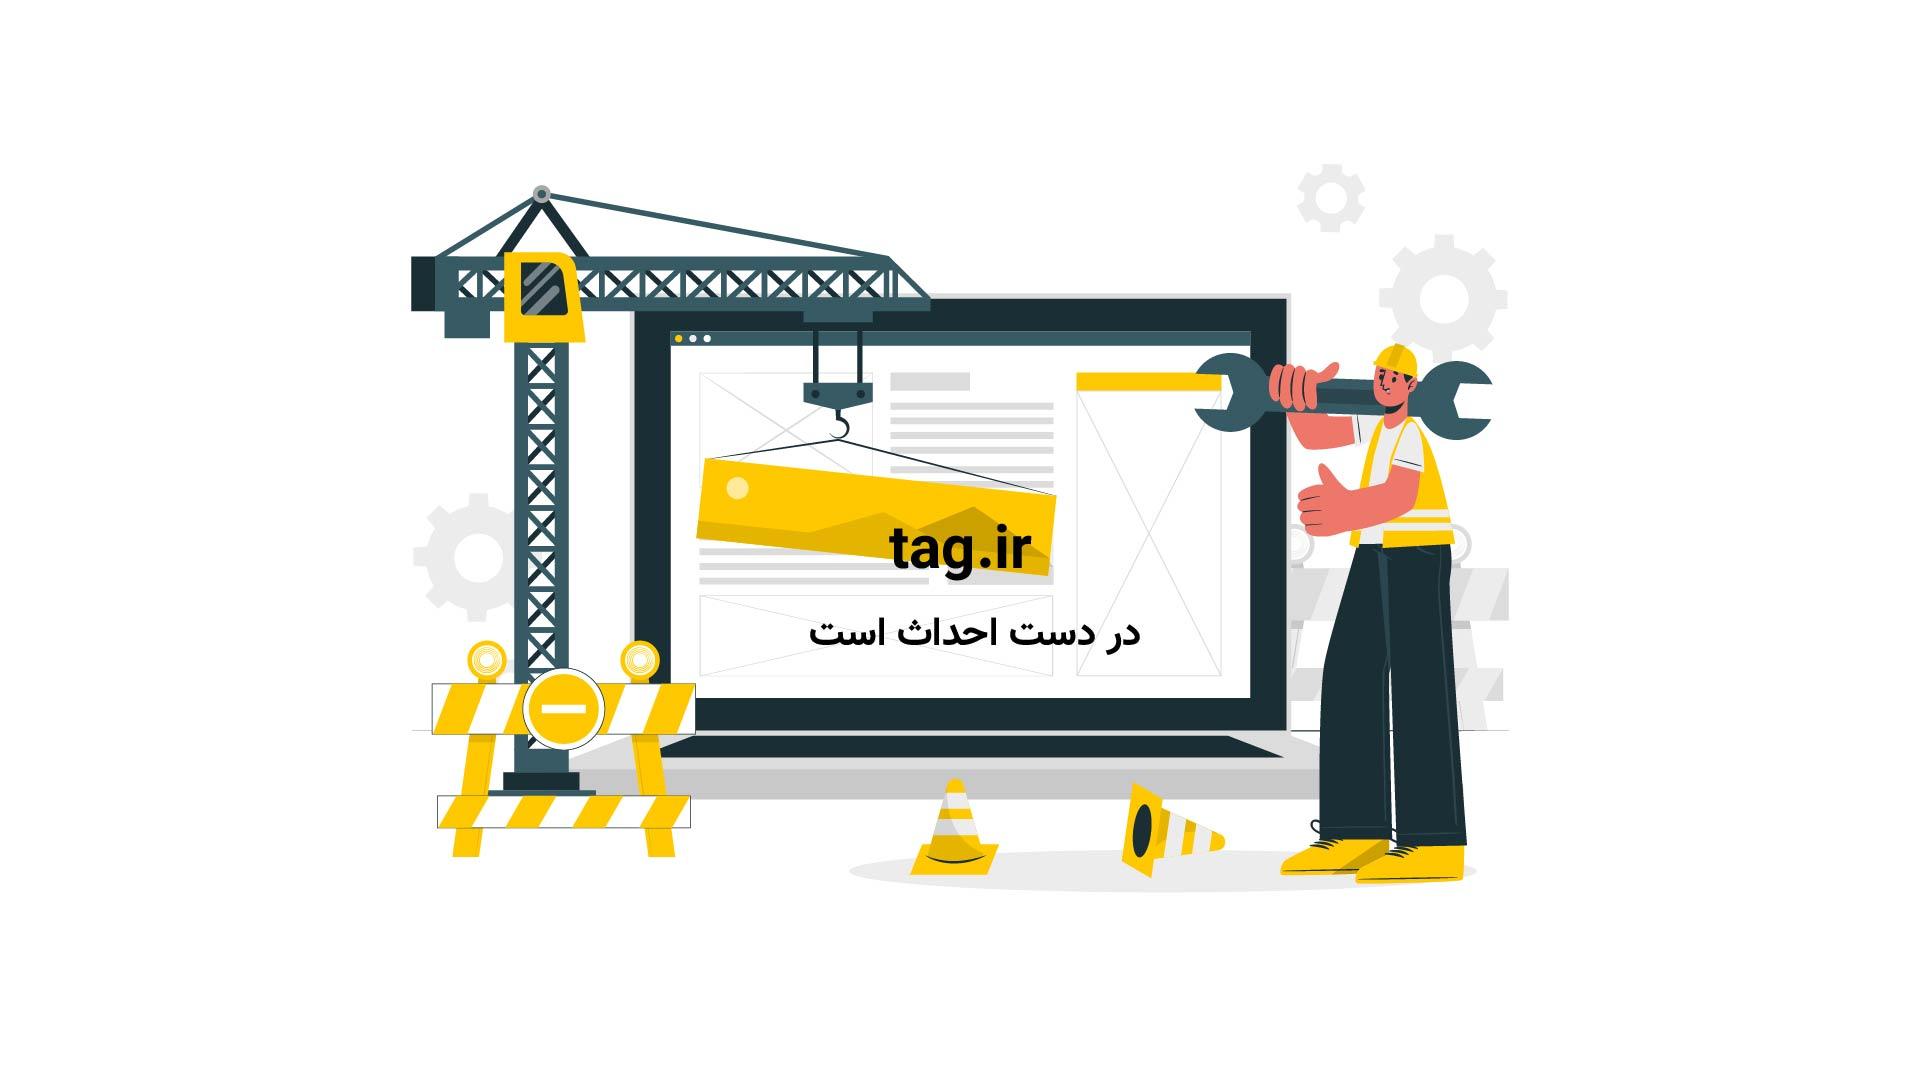 ربات آشپز | تگ